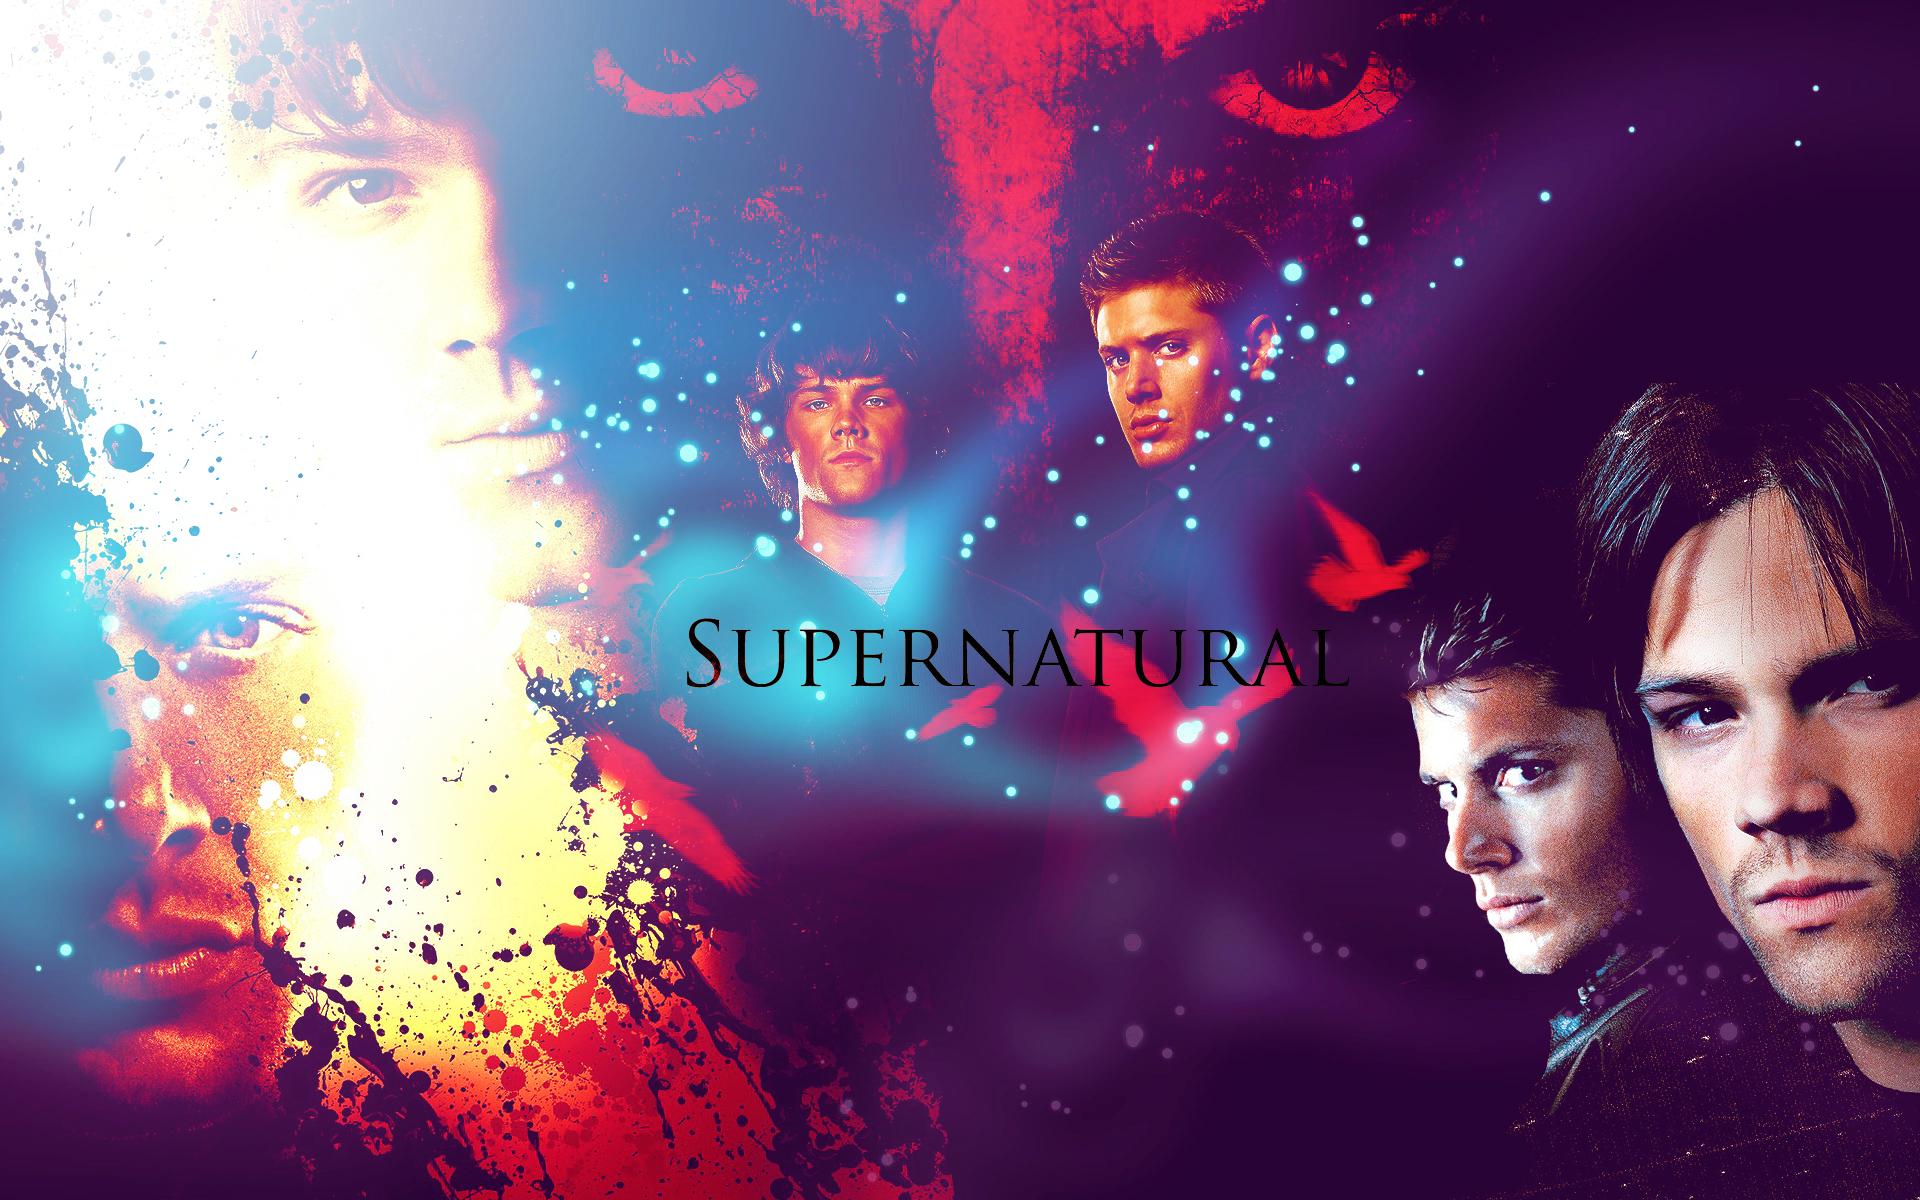 free supernatural wallpaper 20554